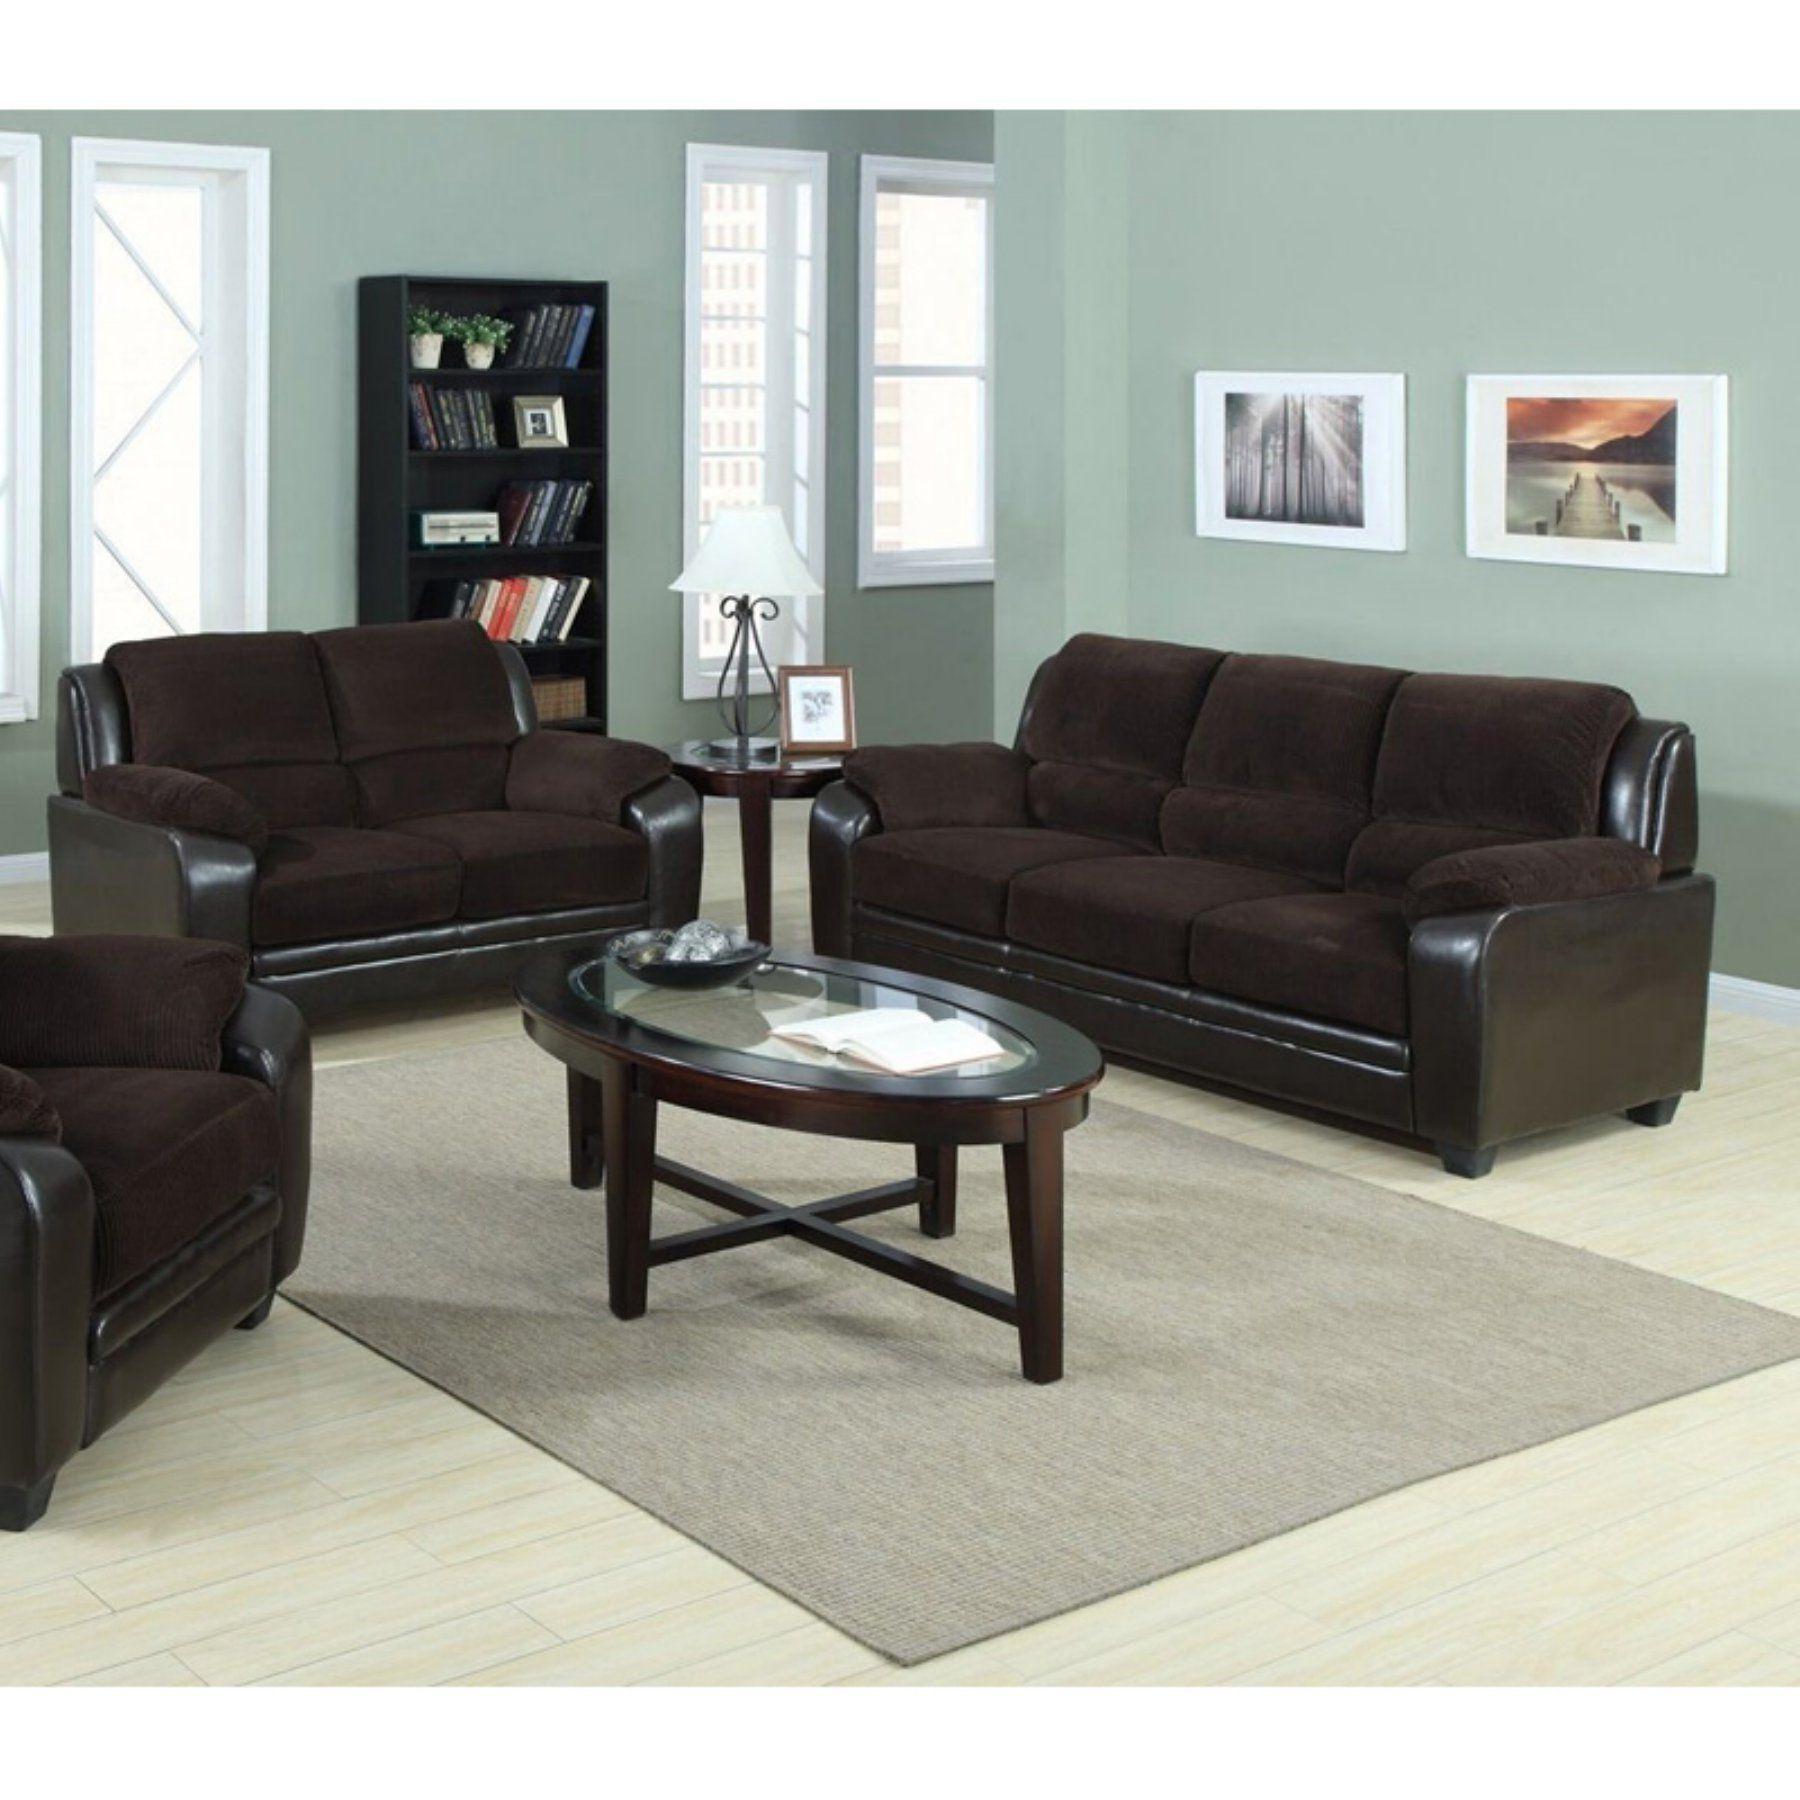 Best Us Pride Furniture Rocco 2 Piece Sofa Set S5005 2Pc 640 x 480